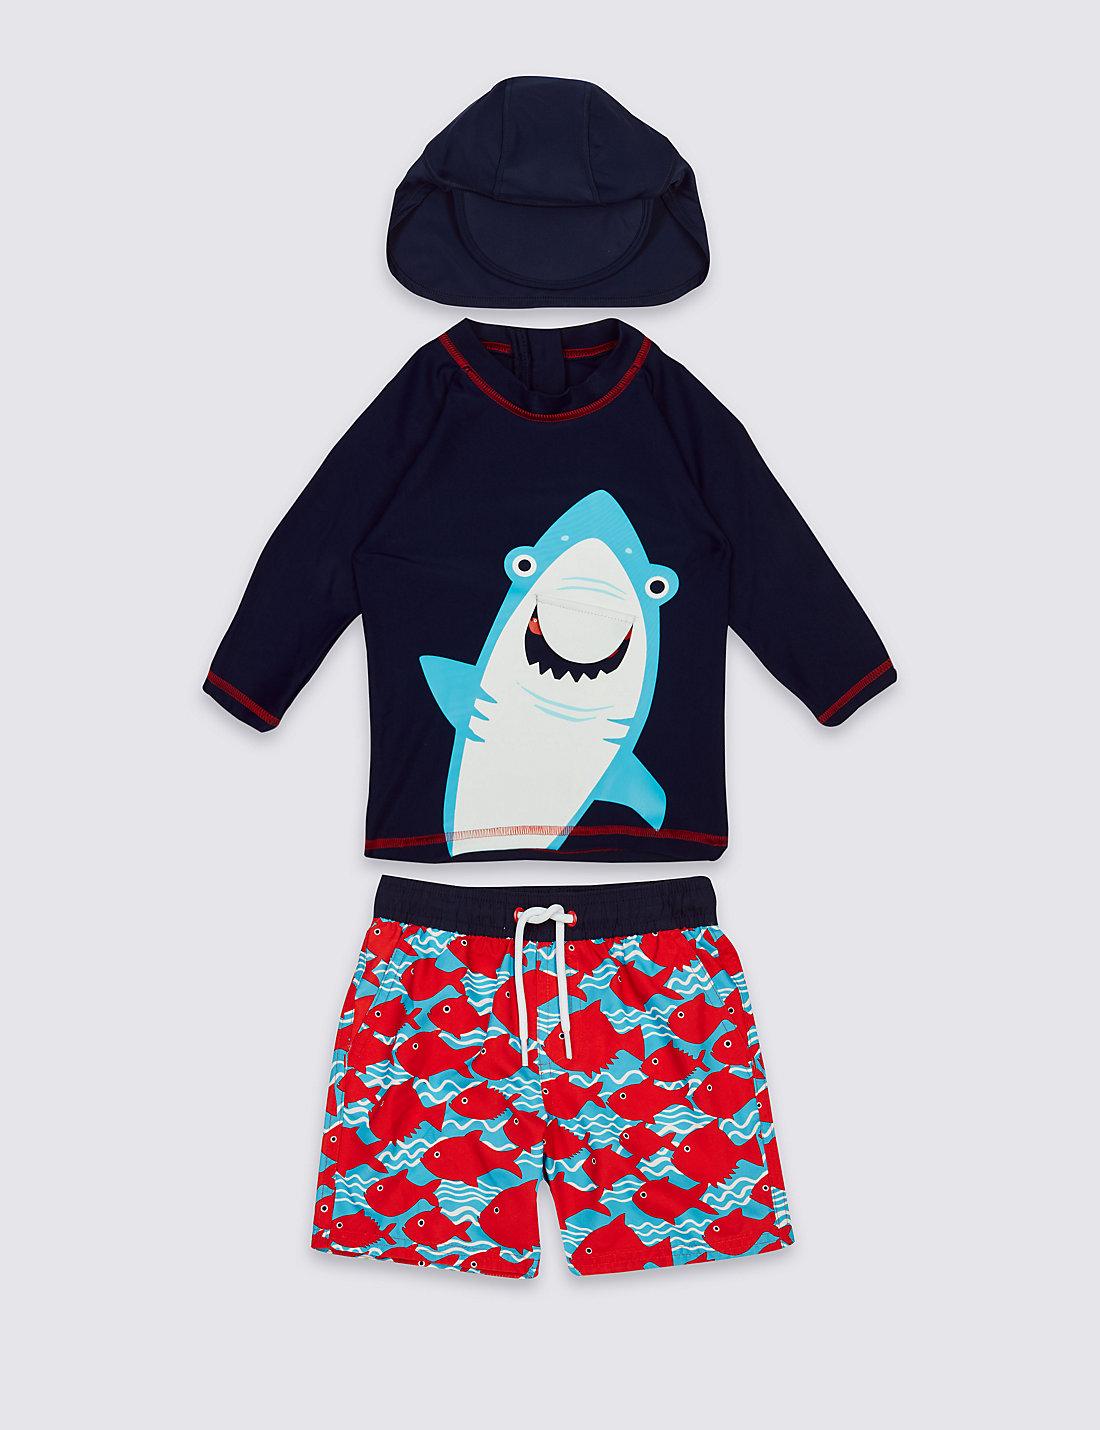 SD_04_T88_2220W_B4_X_EC_0?$PDP_MAXI_ZOOM_NEW$ swimsuit all baby boys m&s,0 3 Swimwear Boy